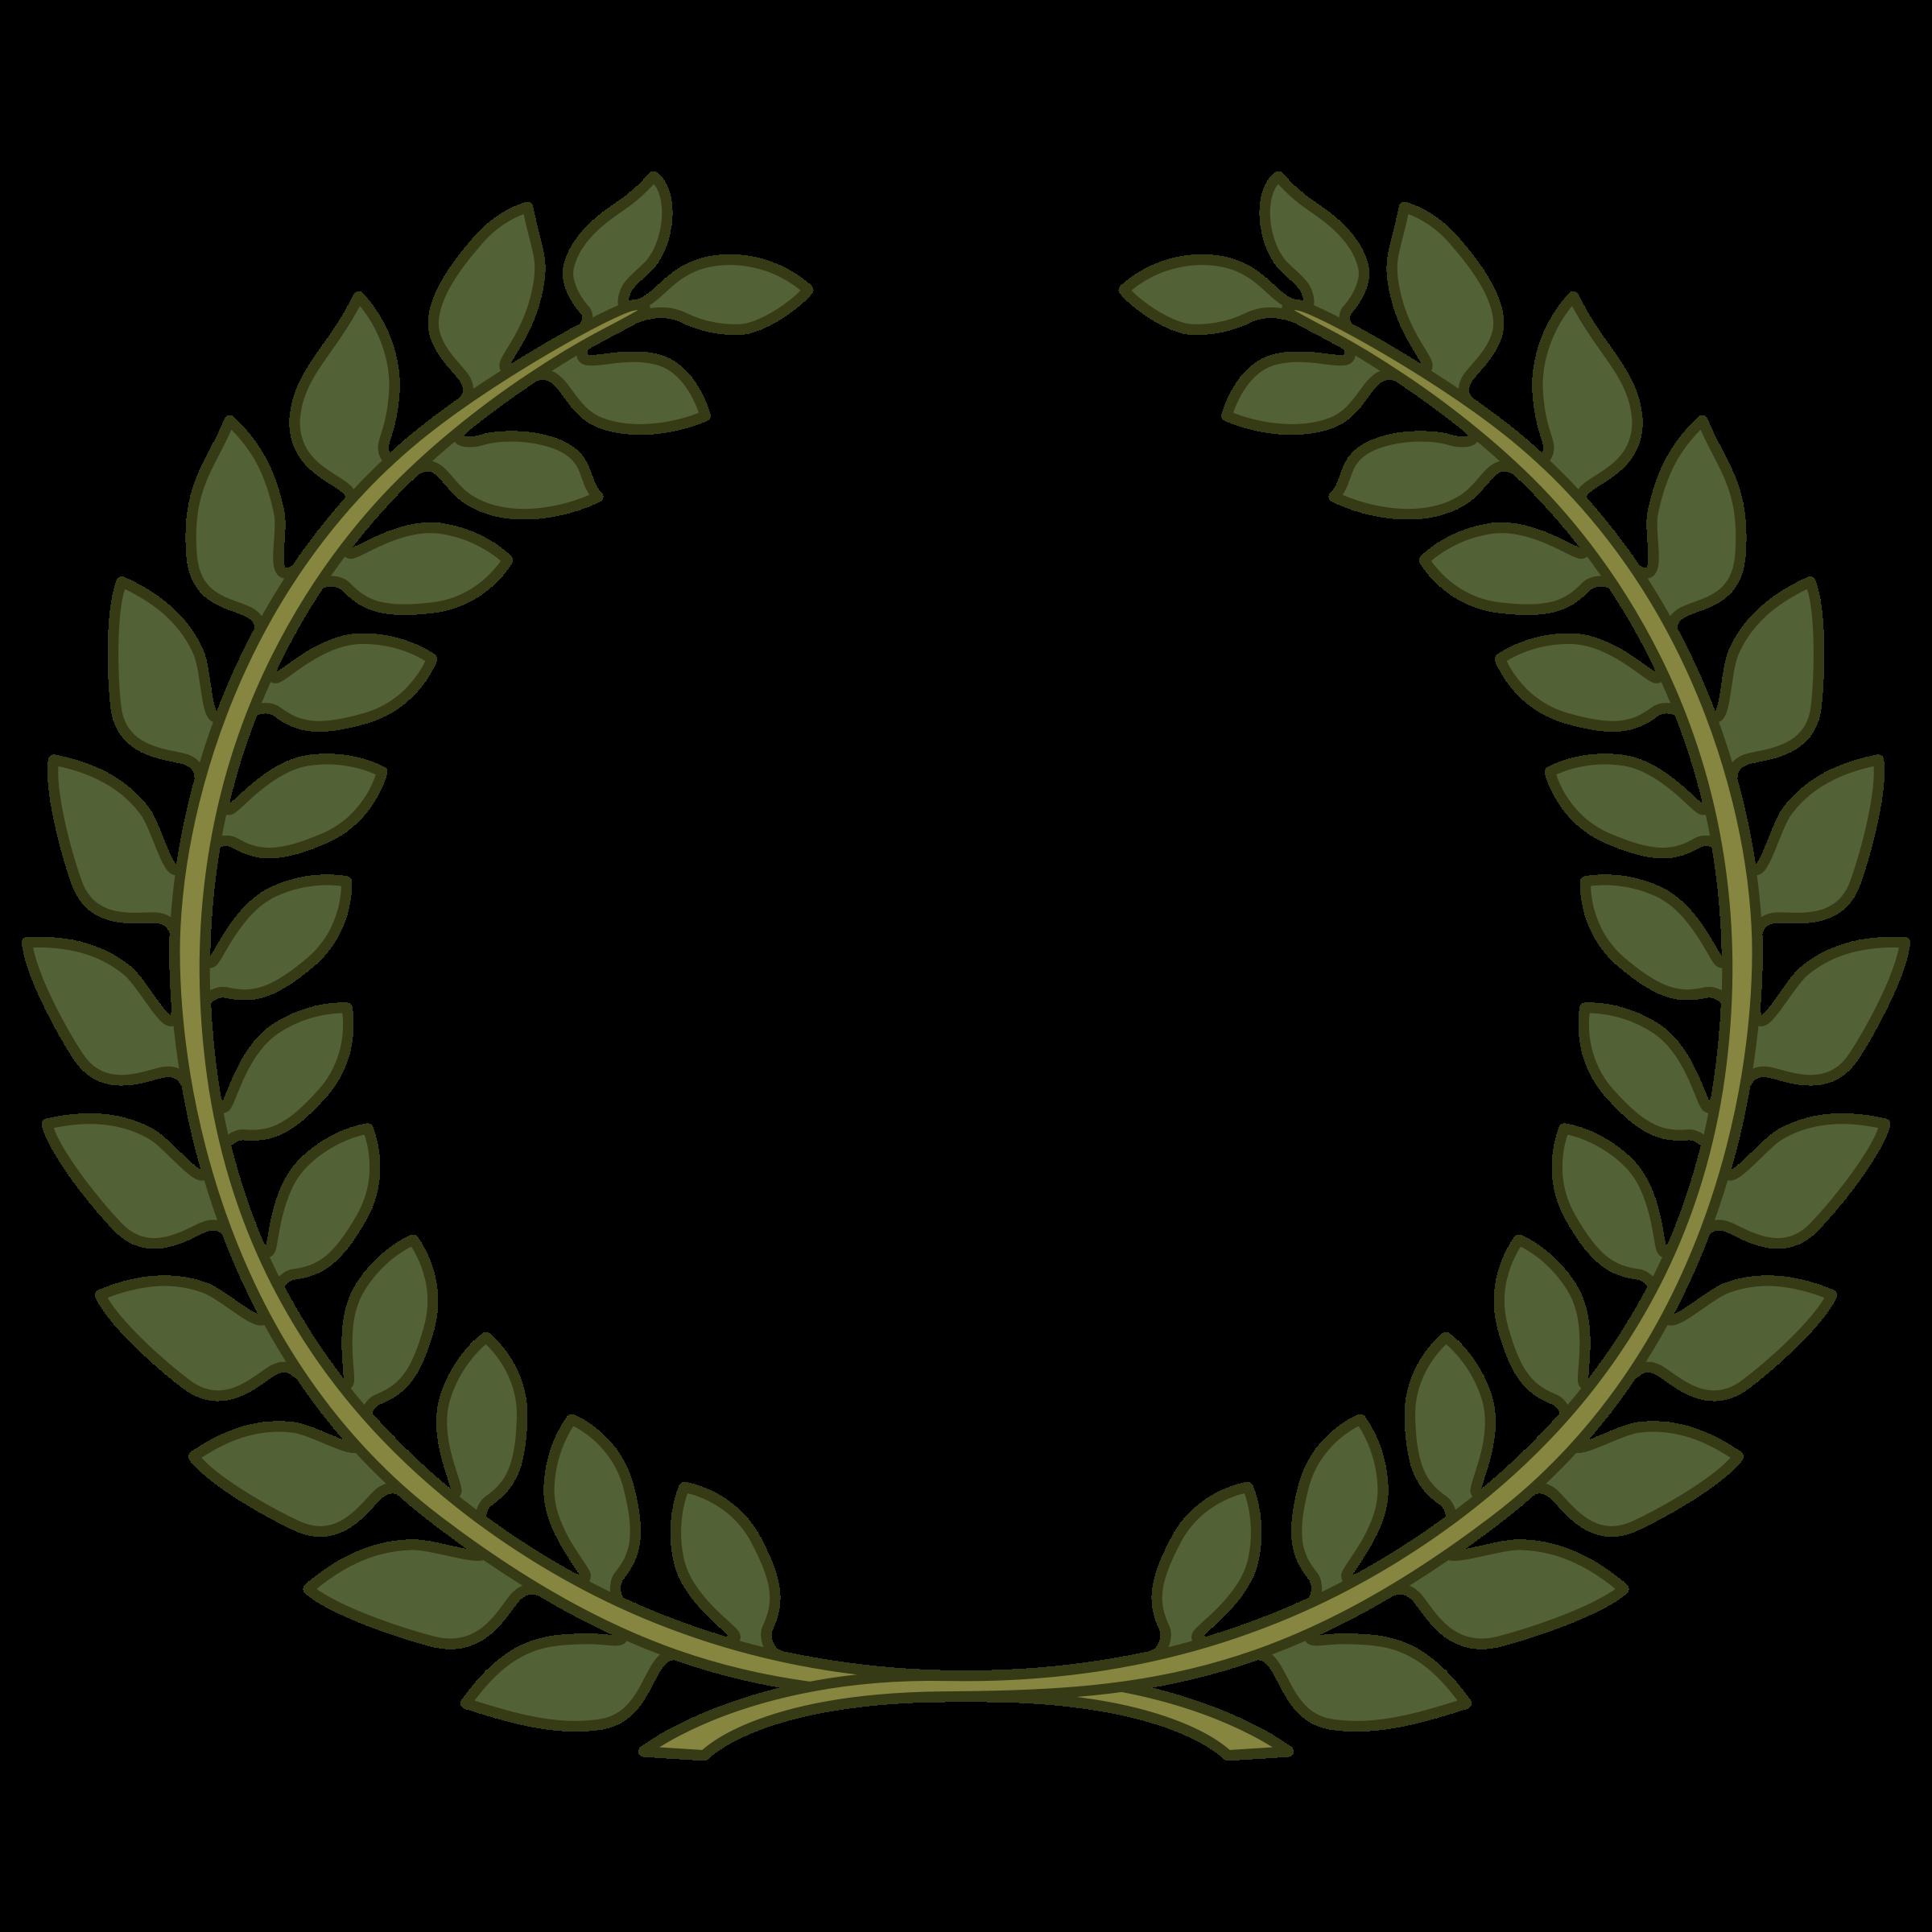 Fern clipart olive.  views pinterest wreath